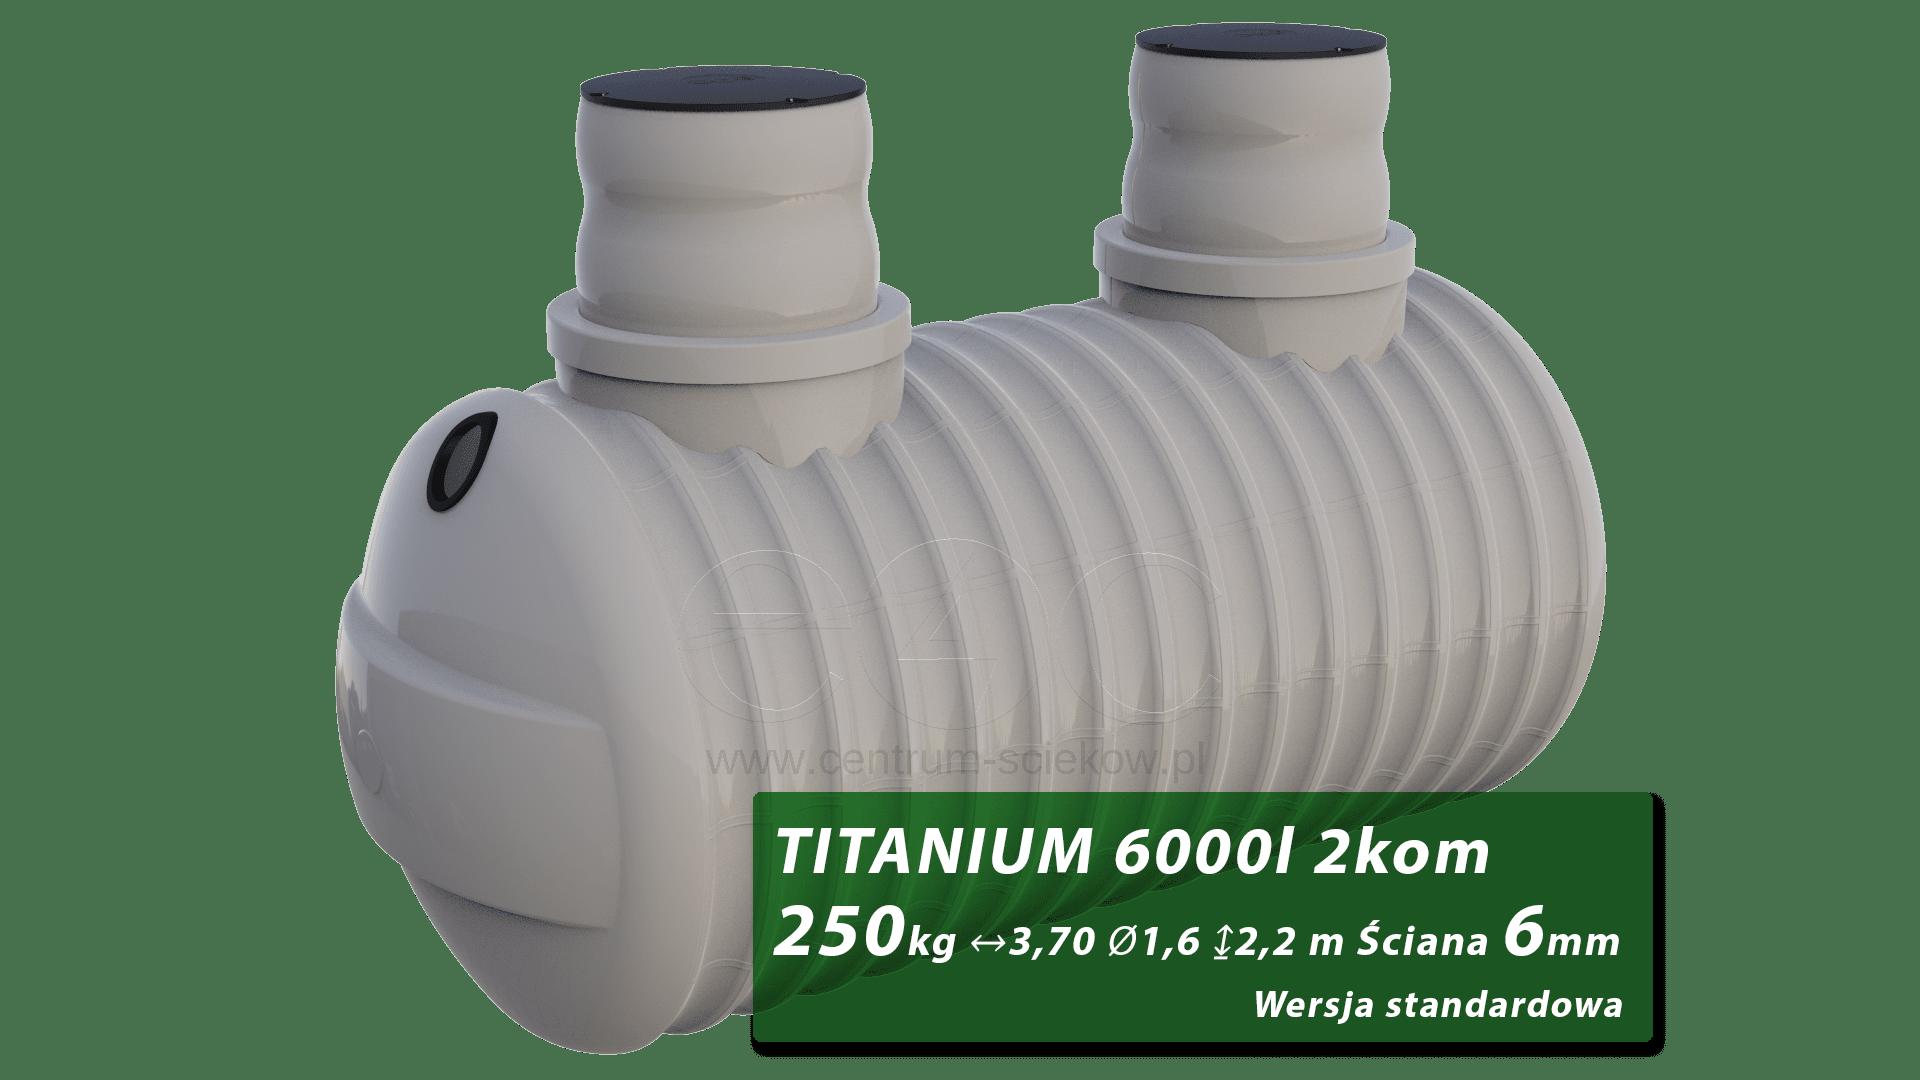 Plastikowy Zbiornik Na Szambo Titanium Dwukomorowy 6 M3 Centrum Sciekow Pl